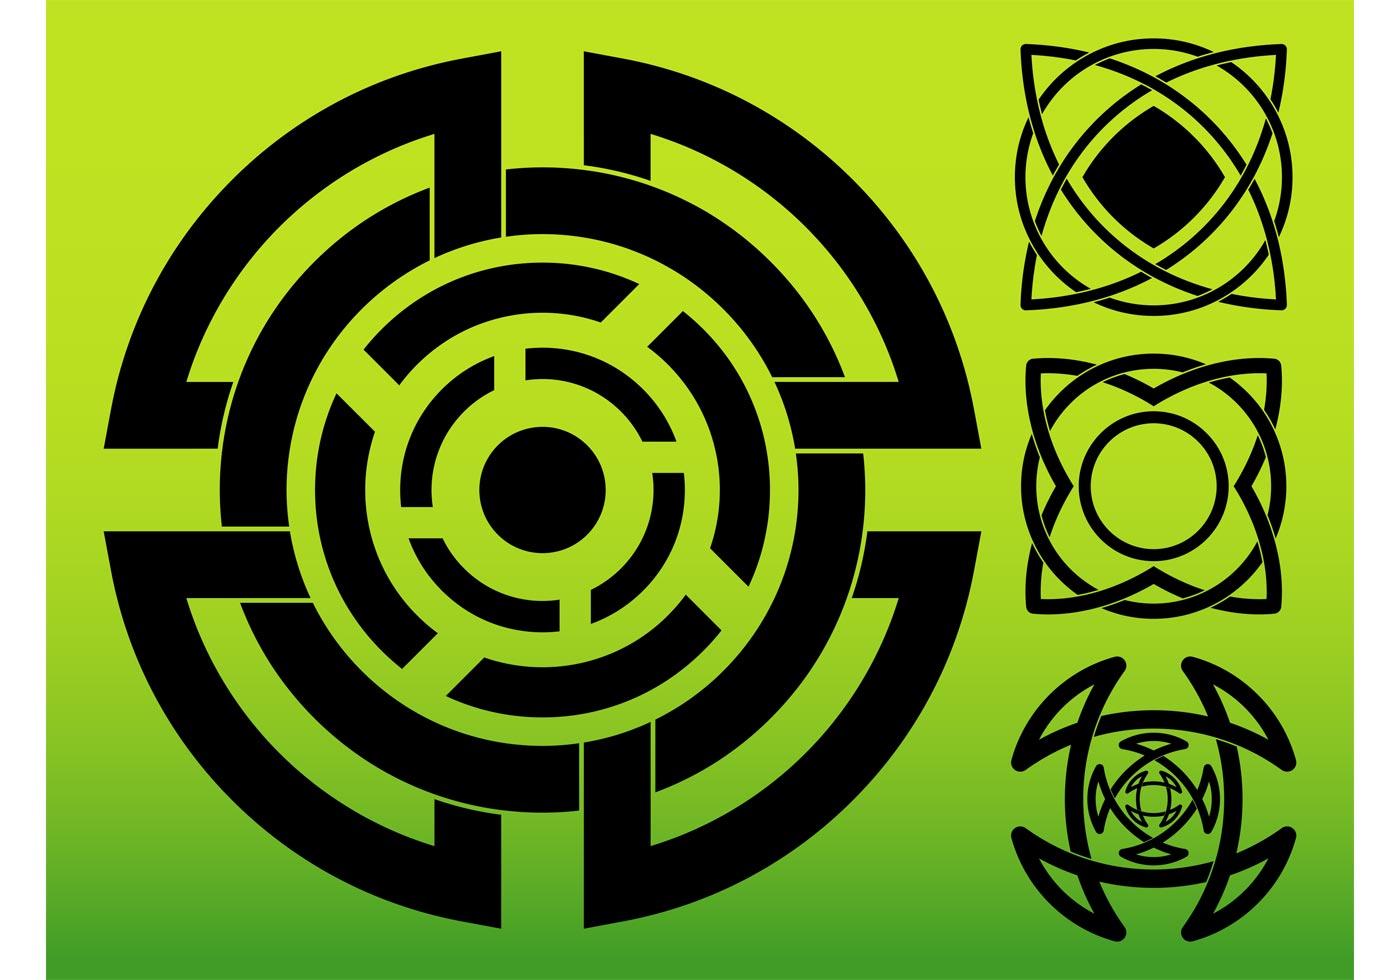 Tribal Designs - Download Free Vector Art, Stock Graphics ... - photo#8